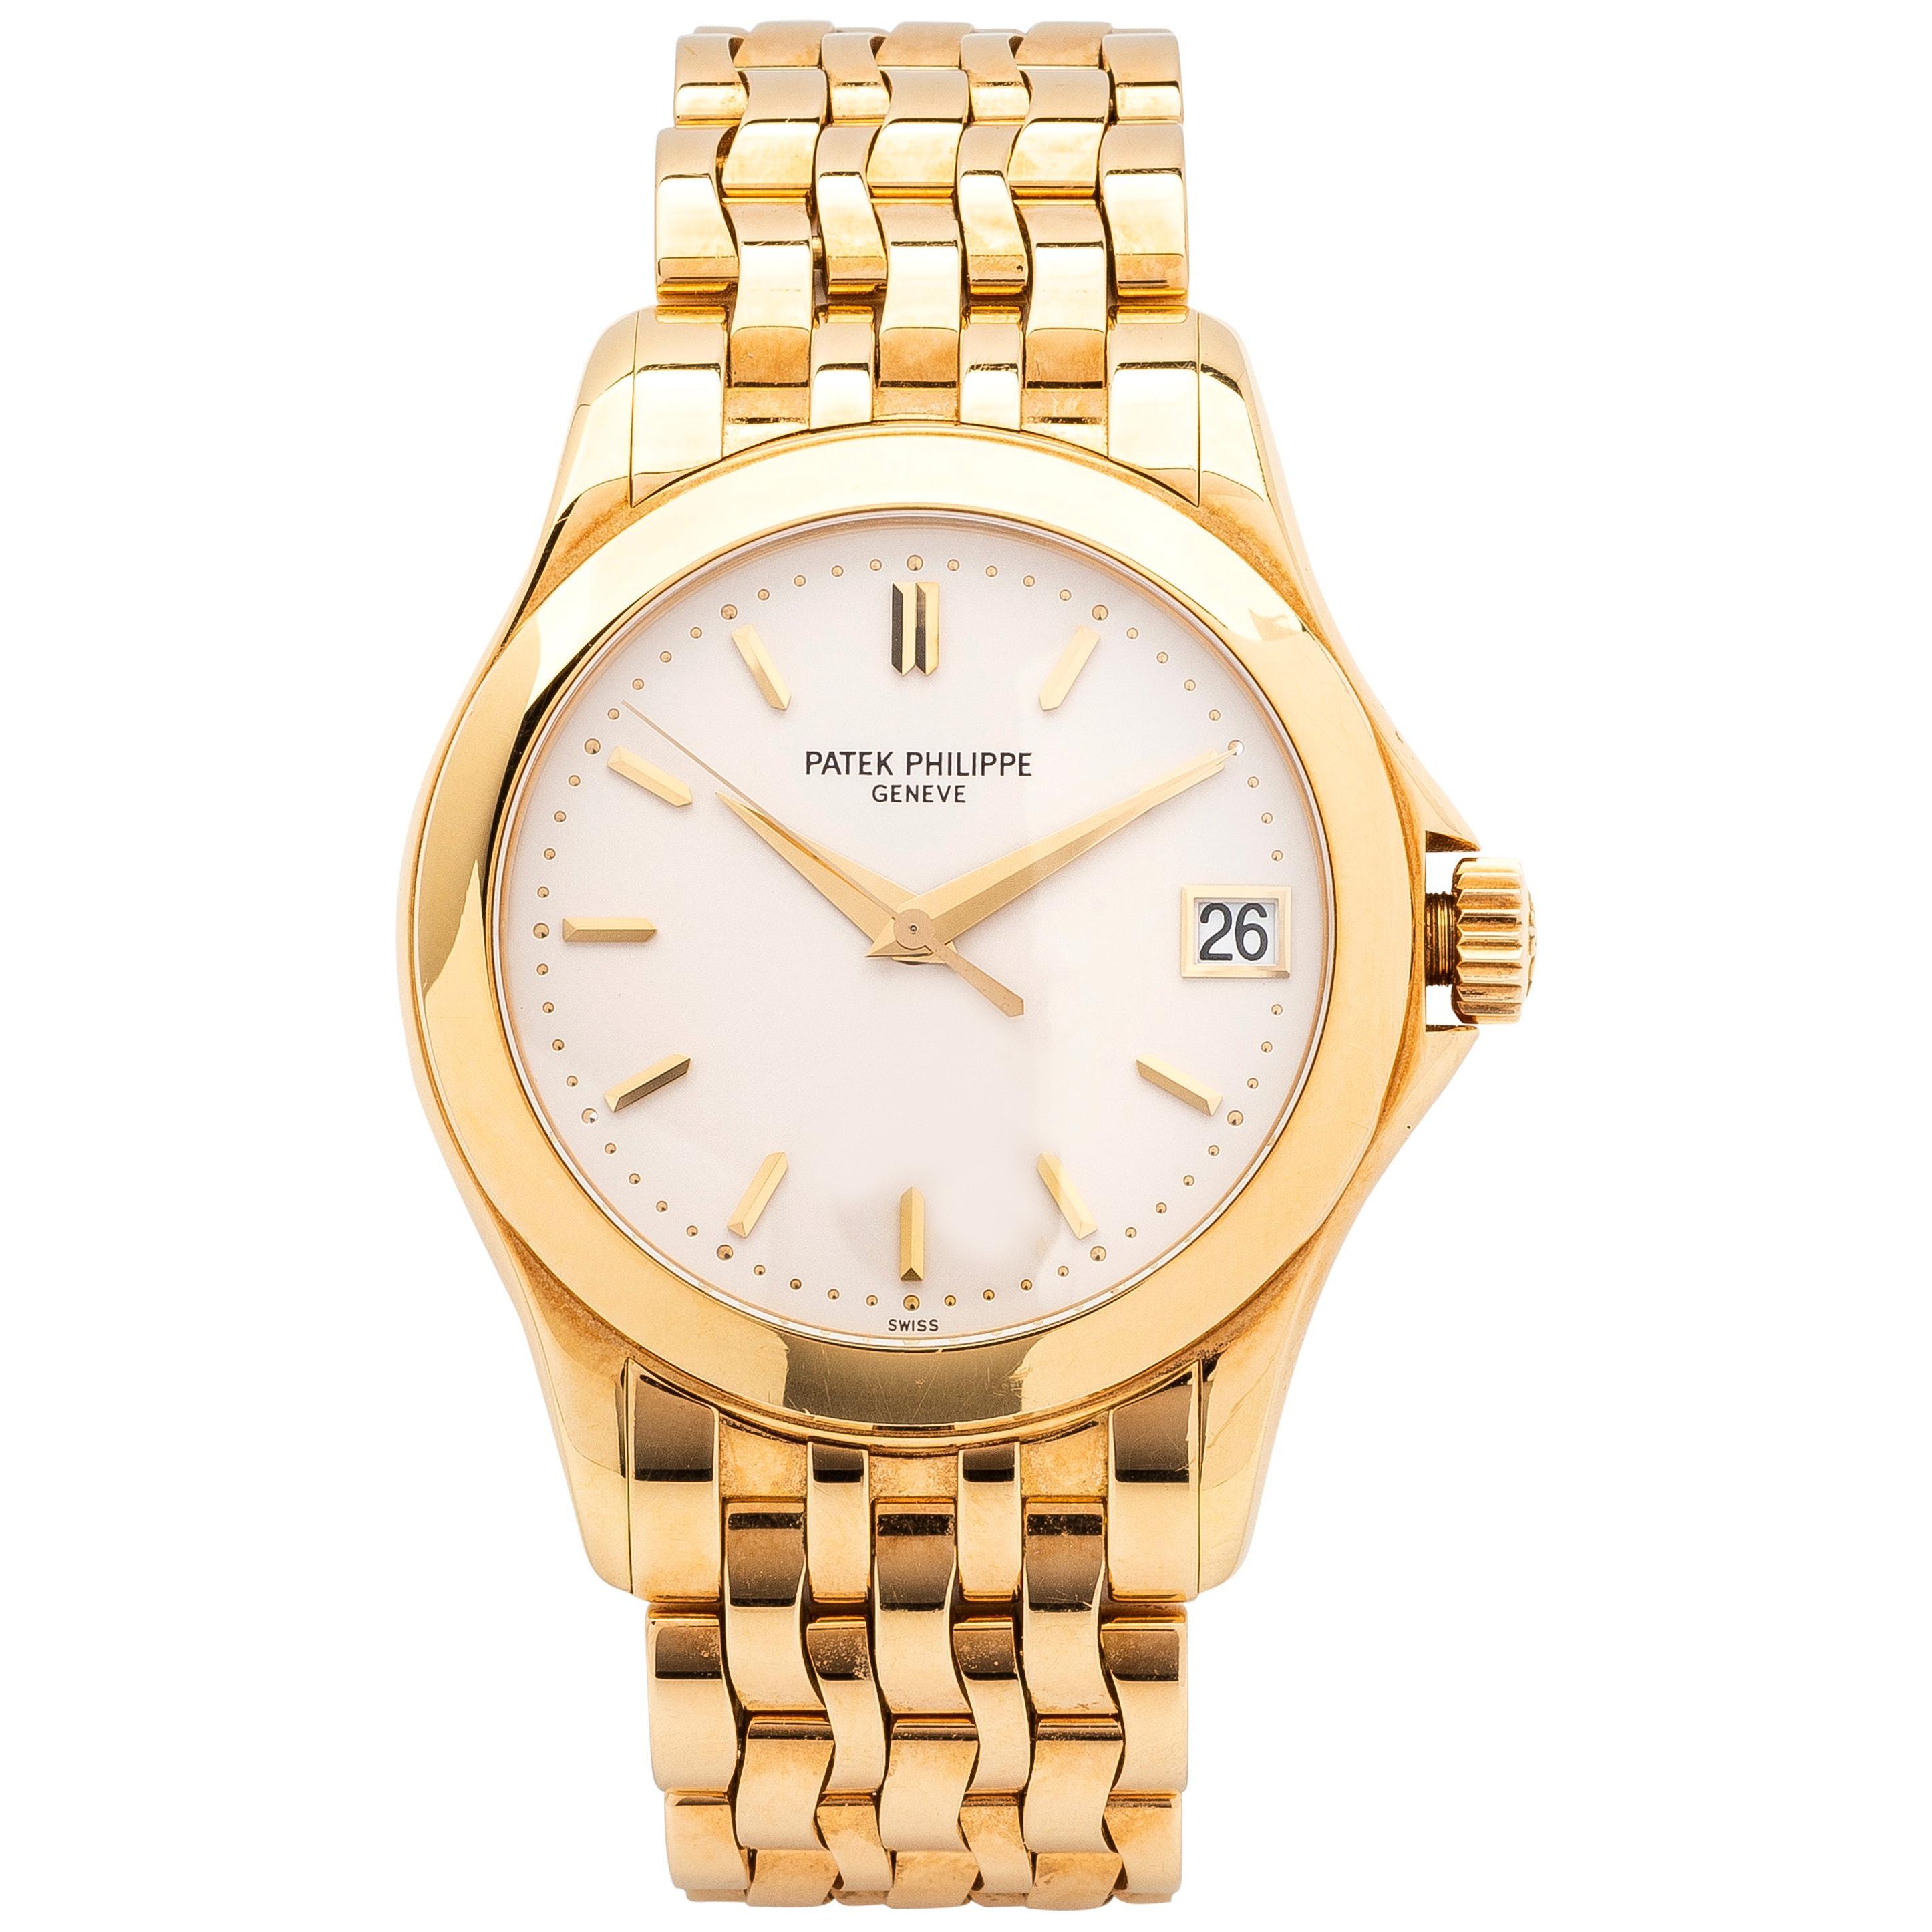 Patek Philippe Calatrava 18 Karat Yellow Gold Watch